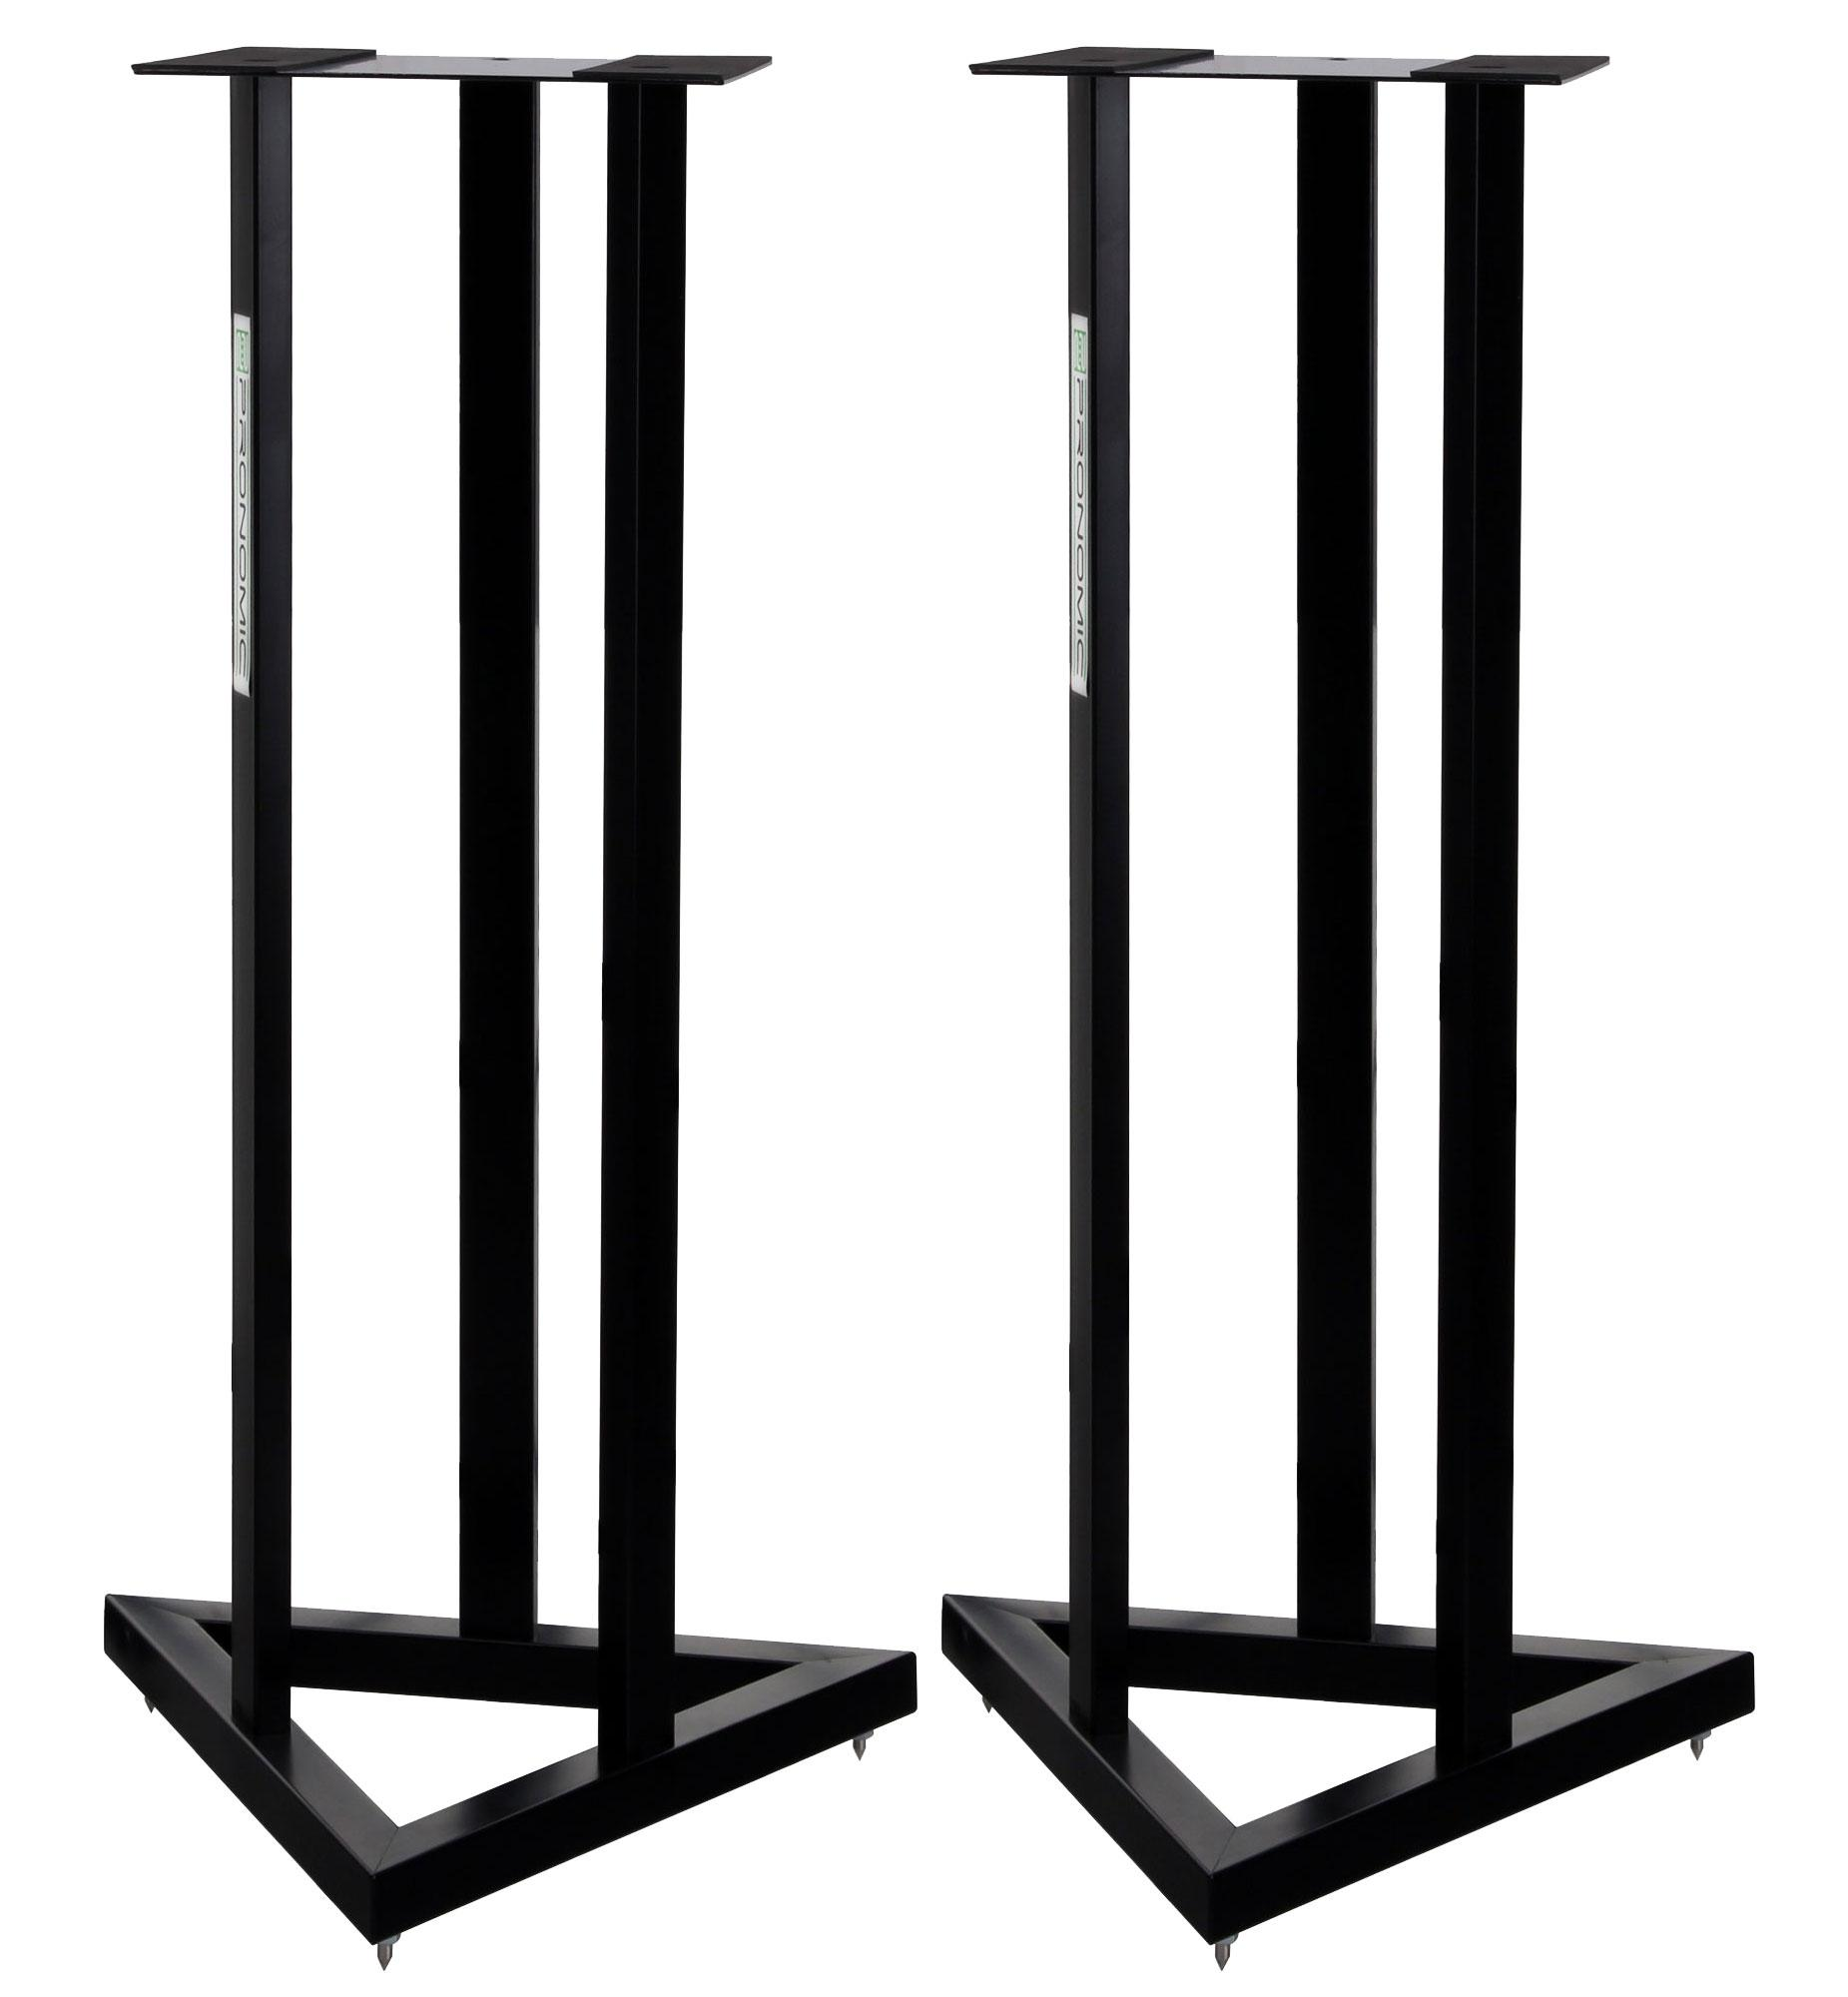 pronomic scs 20 speaker stand for studio monitor pair of stands. Black Bedroom Furniture Sets. Home Design Ideas